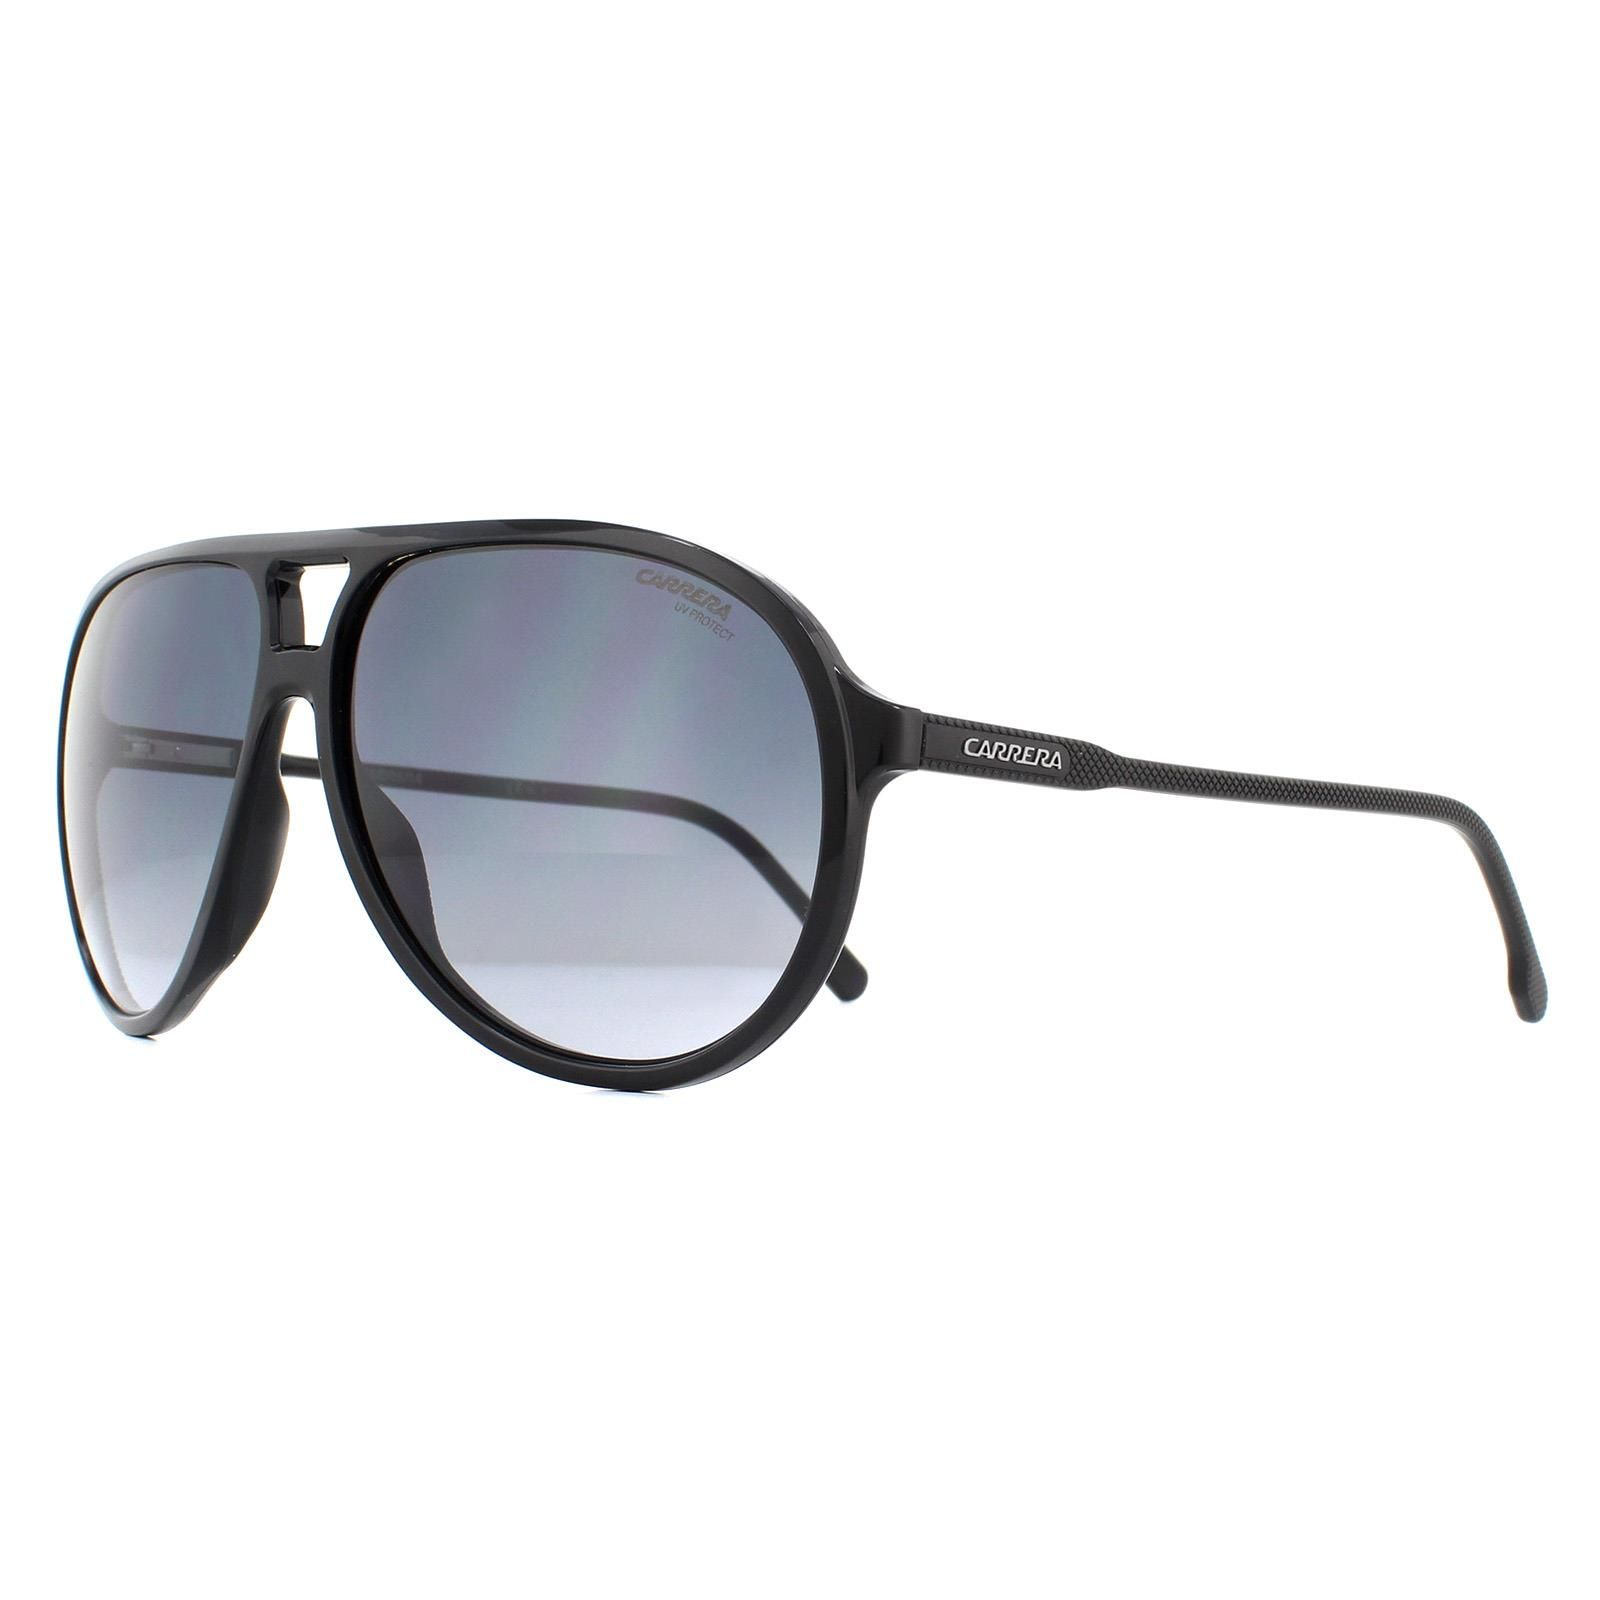 Carrera Sunglasses 237/S 807 9O Black Dark Grey